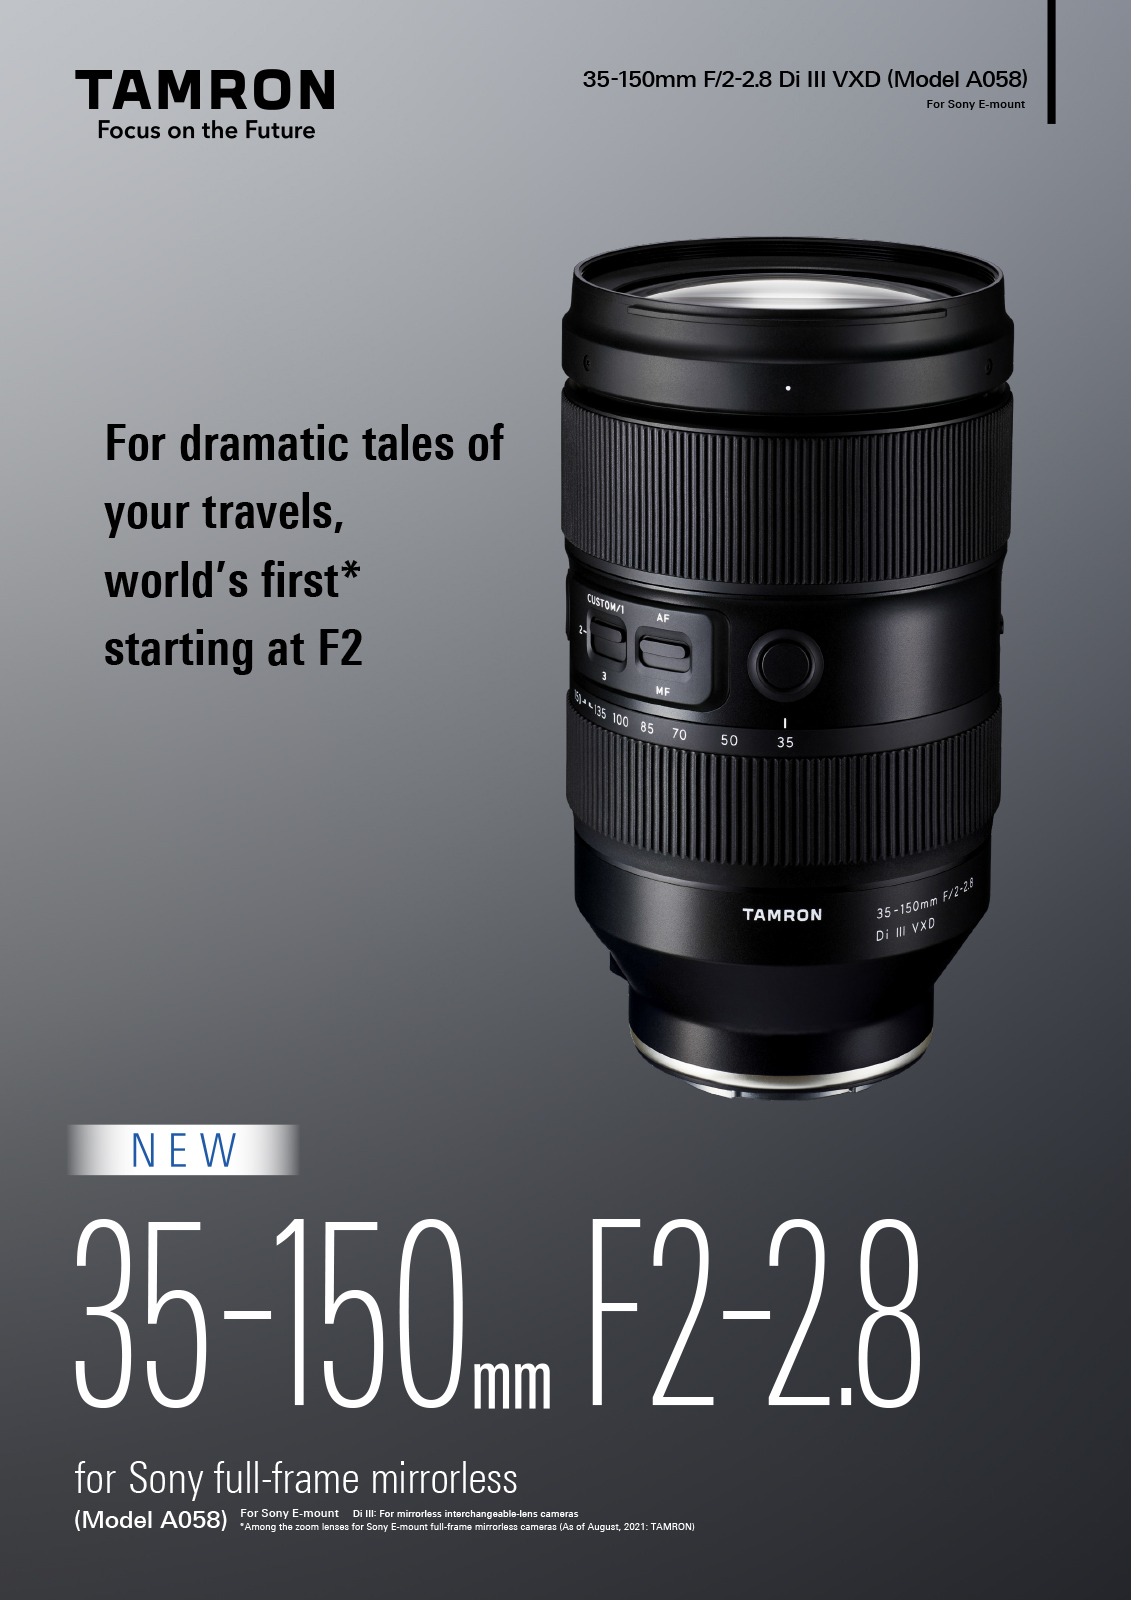 Страница буклета Tamron 35-150mm f/2-2.8 Di III VXD